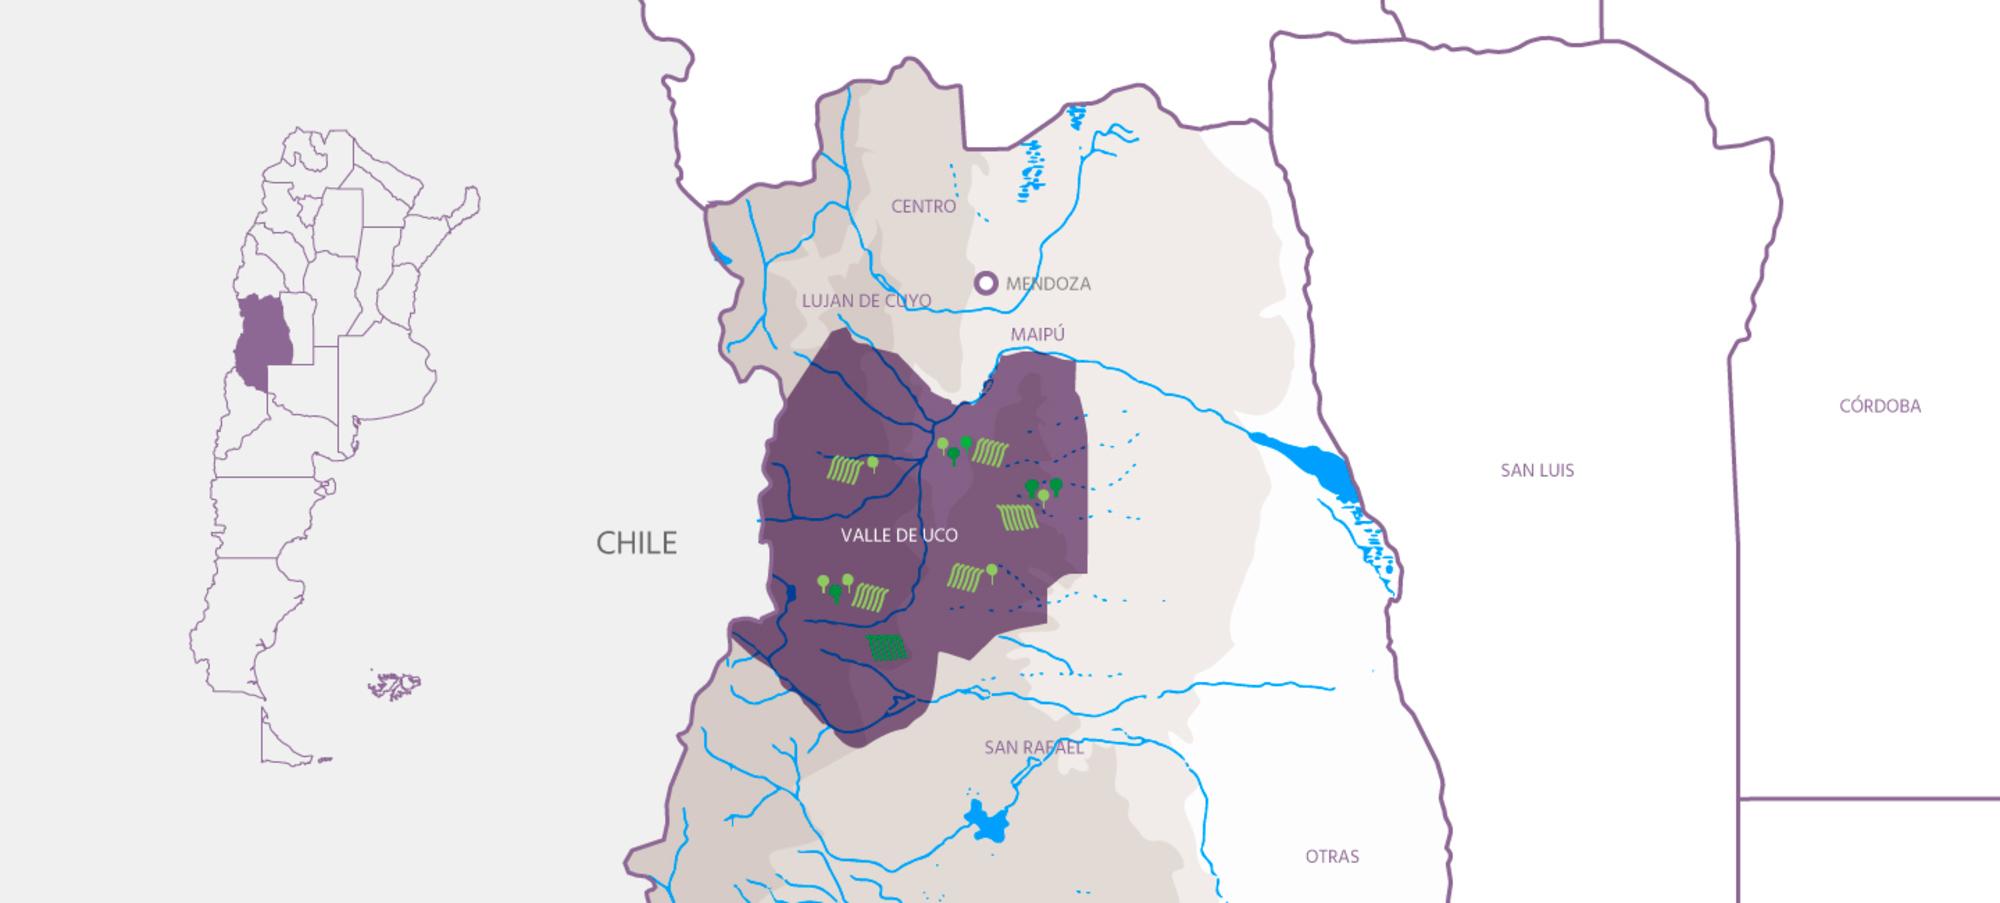 Zona valle de uco